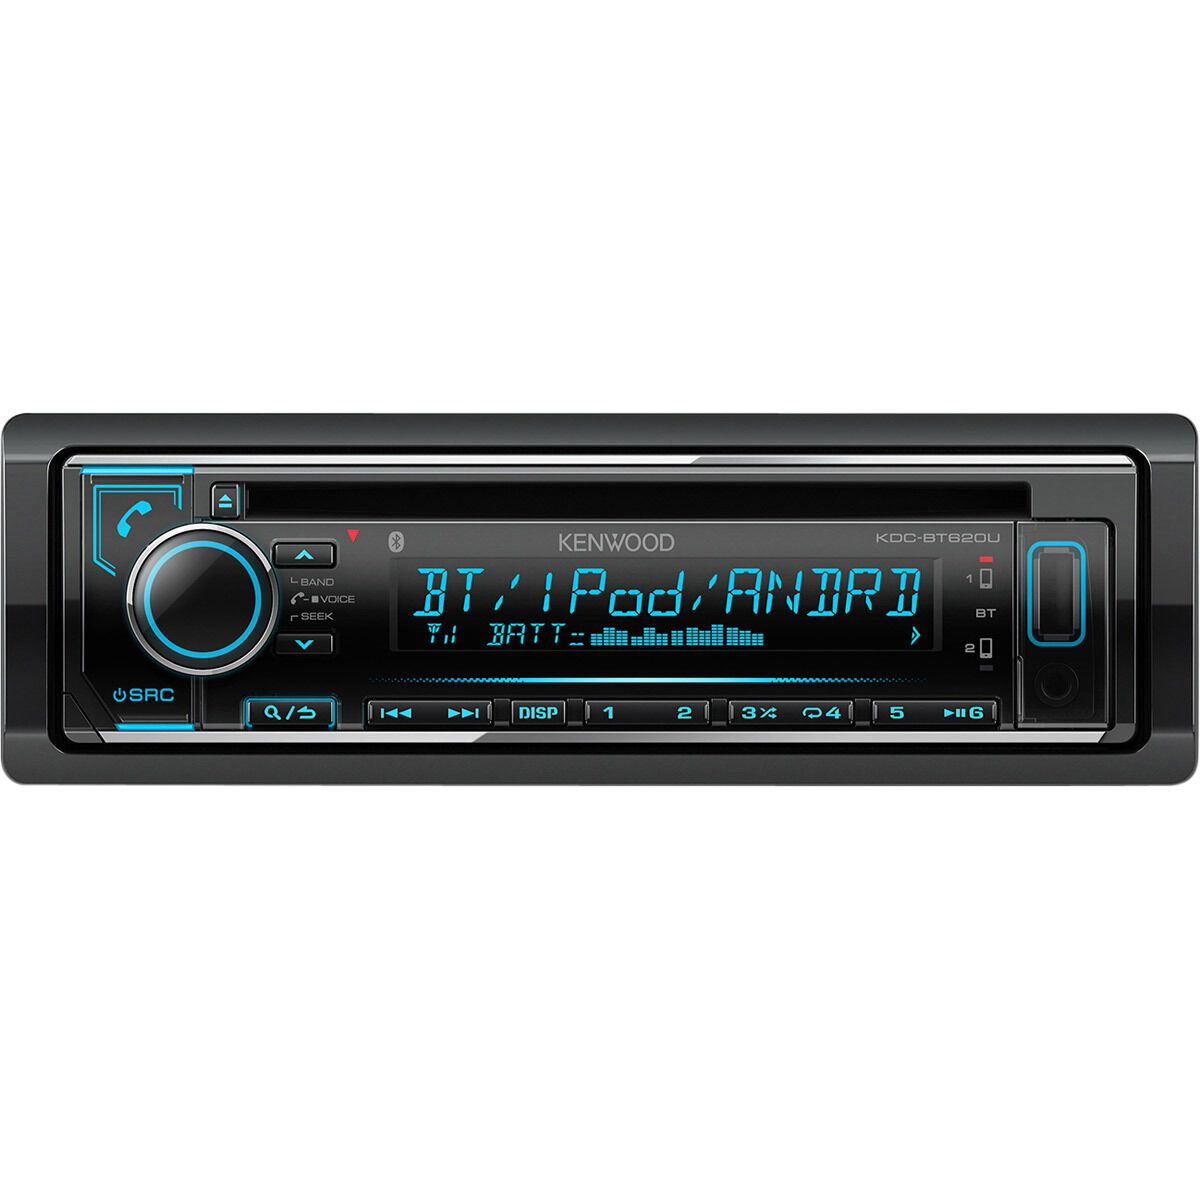 small resolution of kenwood cd digital media player with bluetooth kdc bt620 scaau hi